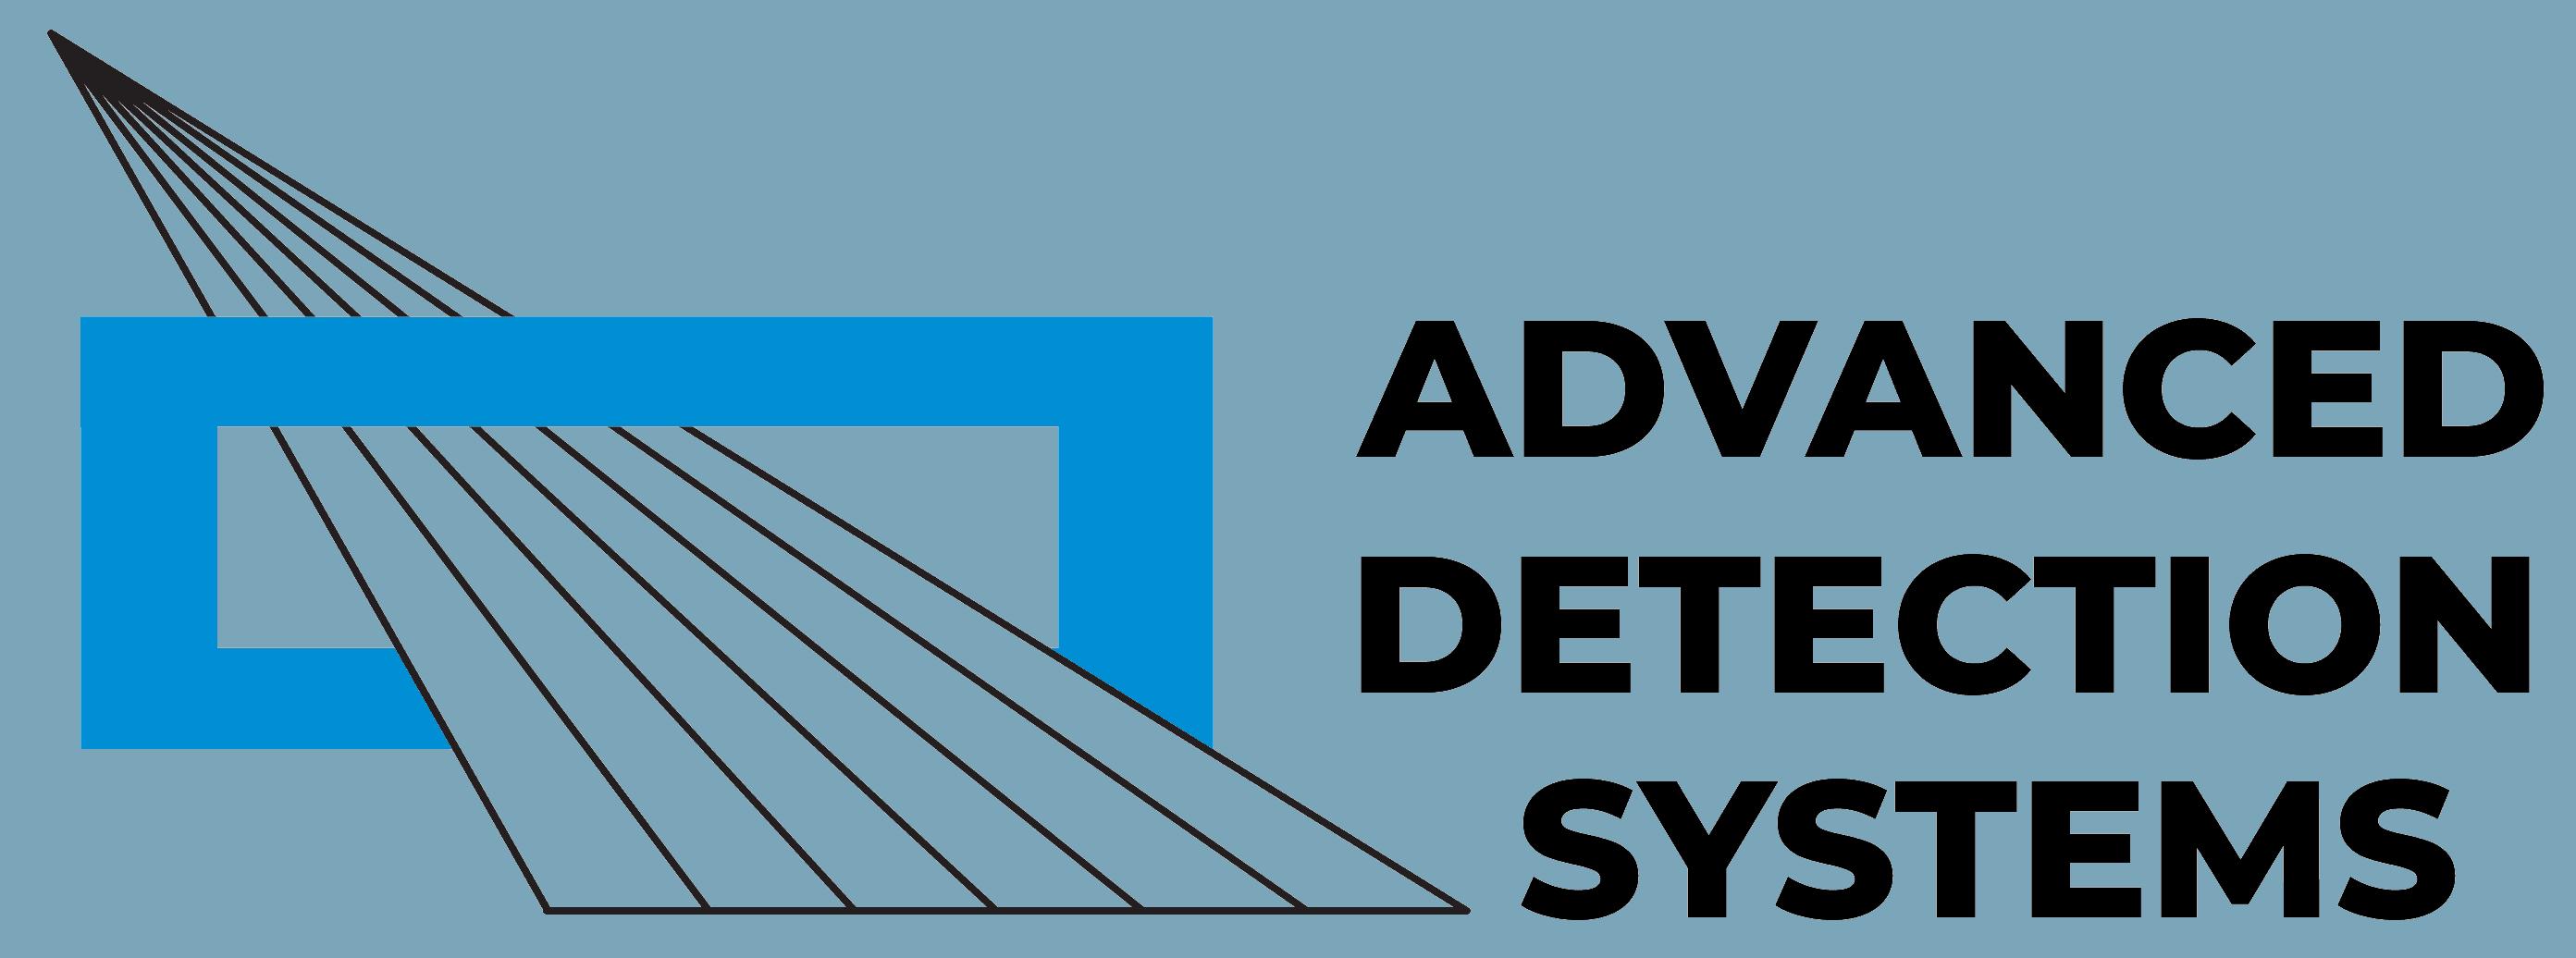 Advanced Detection Systems - BulkInside